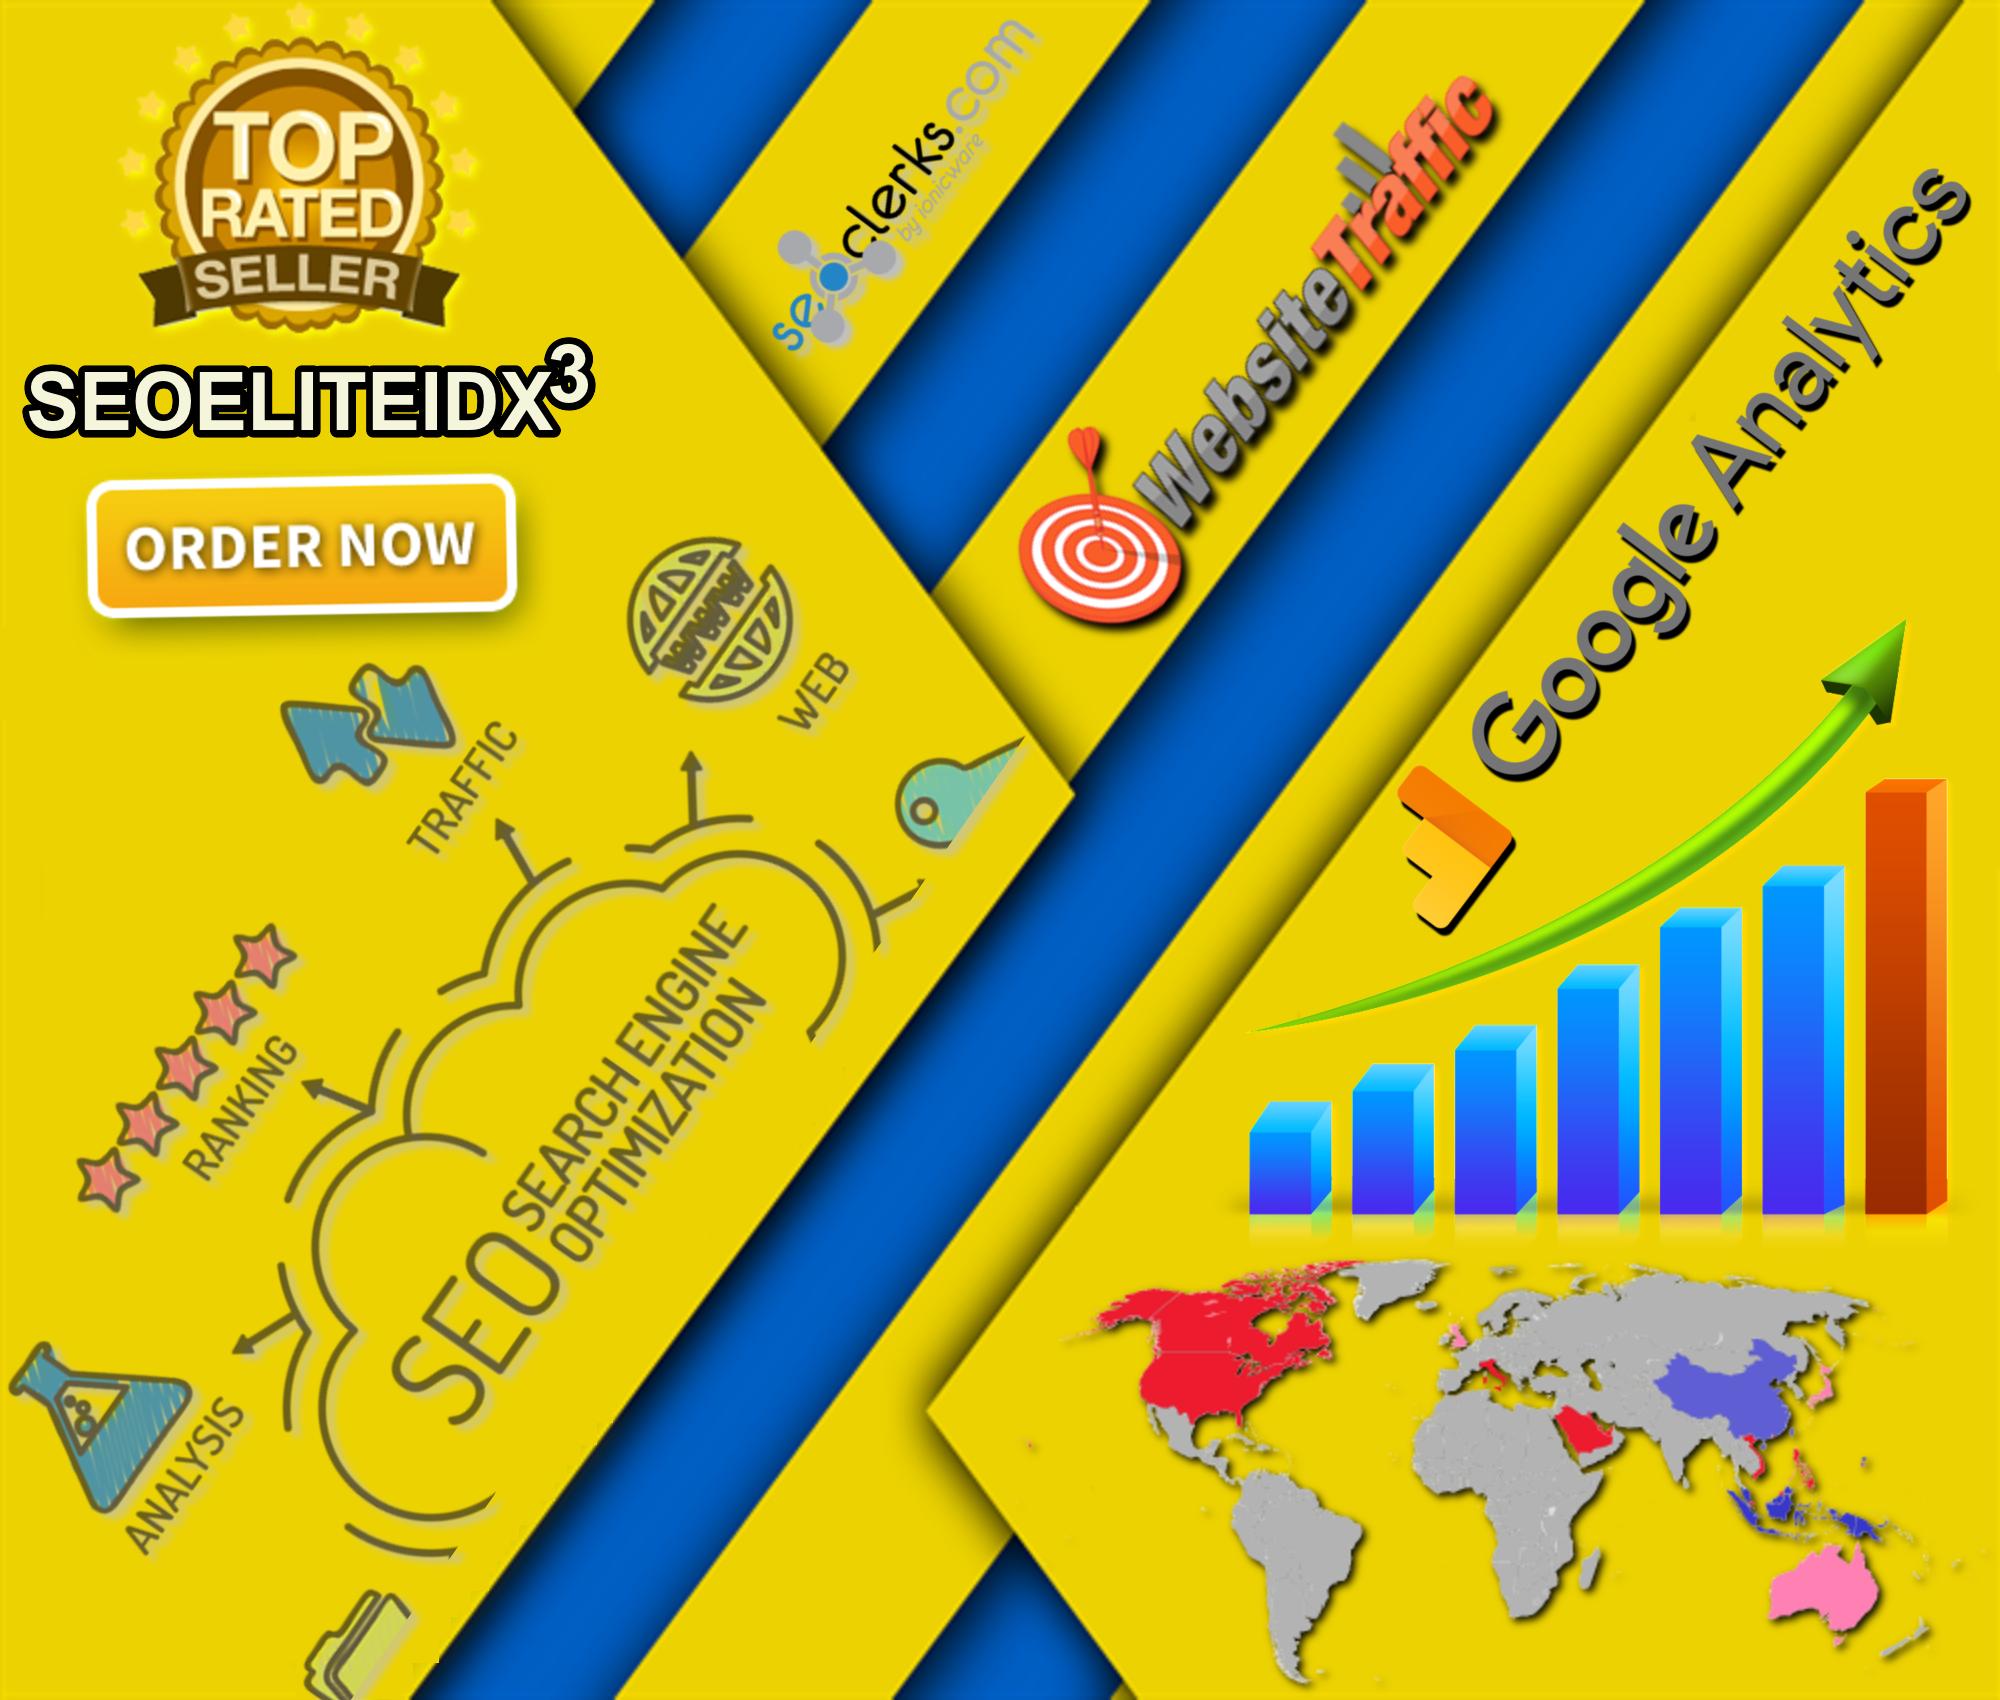 Twenty Thousand 20,000 Worldwide USA Social Media Referral Source Google  Analytics Website Traffic for $20